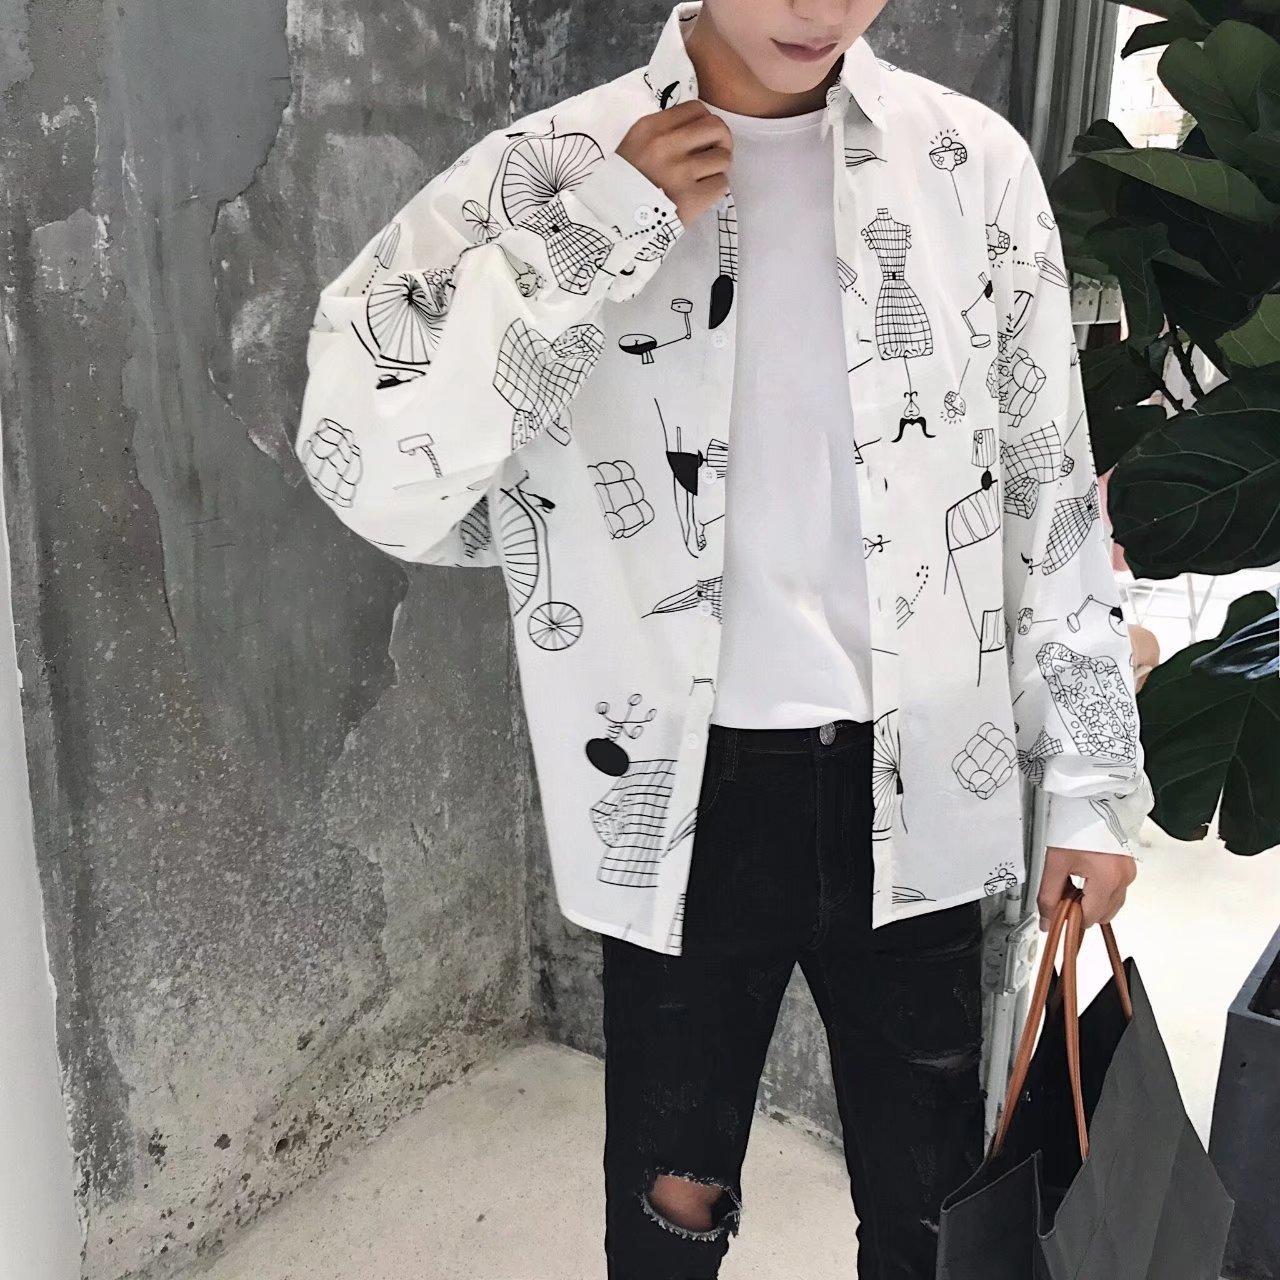 Men Shirt Korean-style New Style Popular Brand Casual Versatile Cool Printed Long-sleeve Blouse Couples Coat